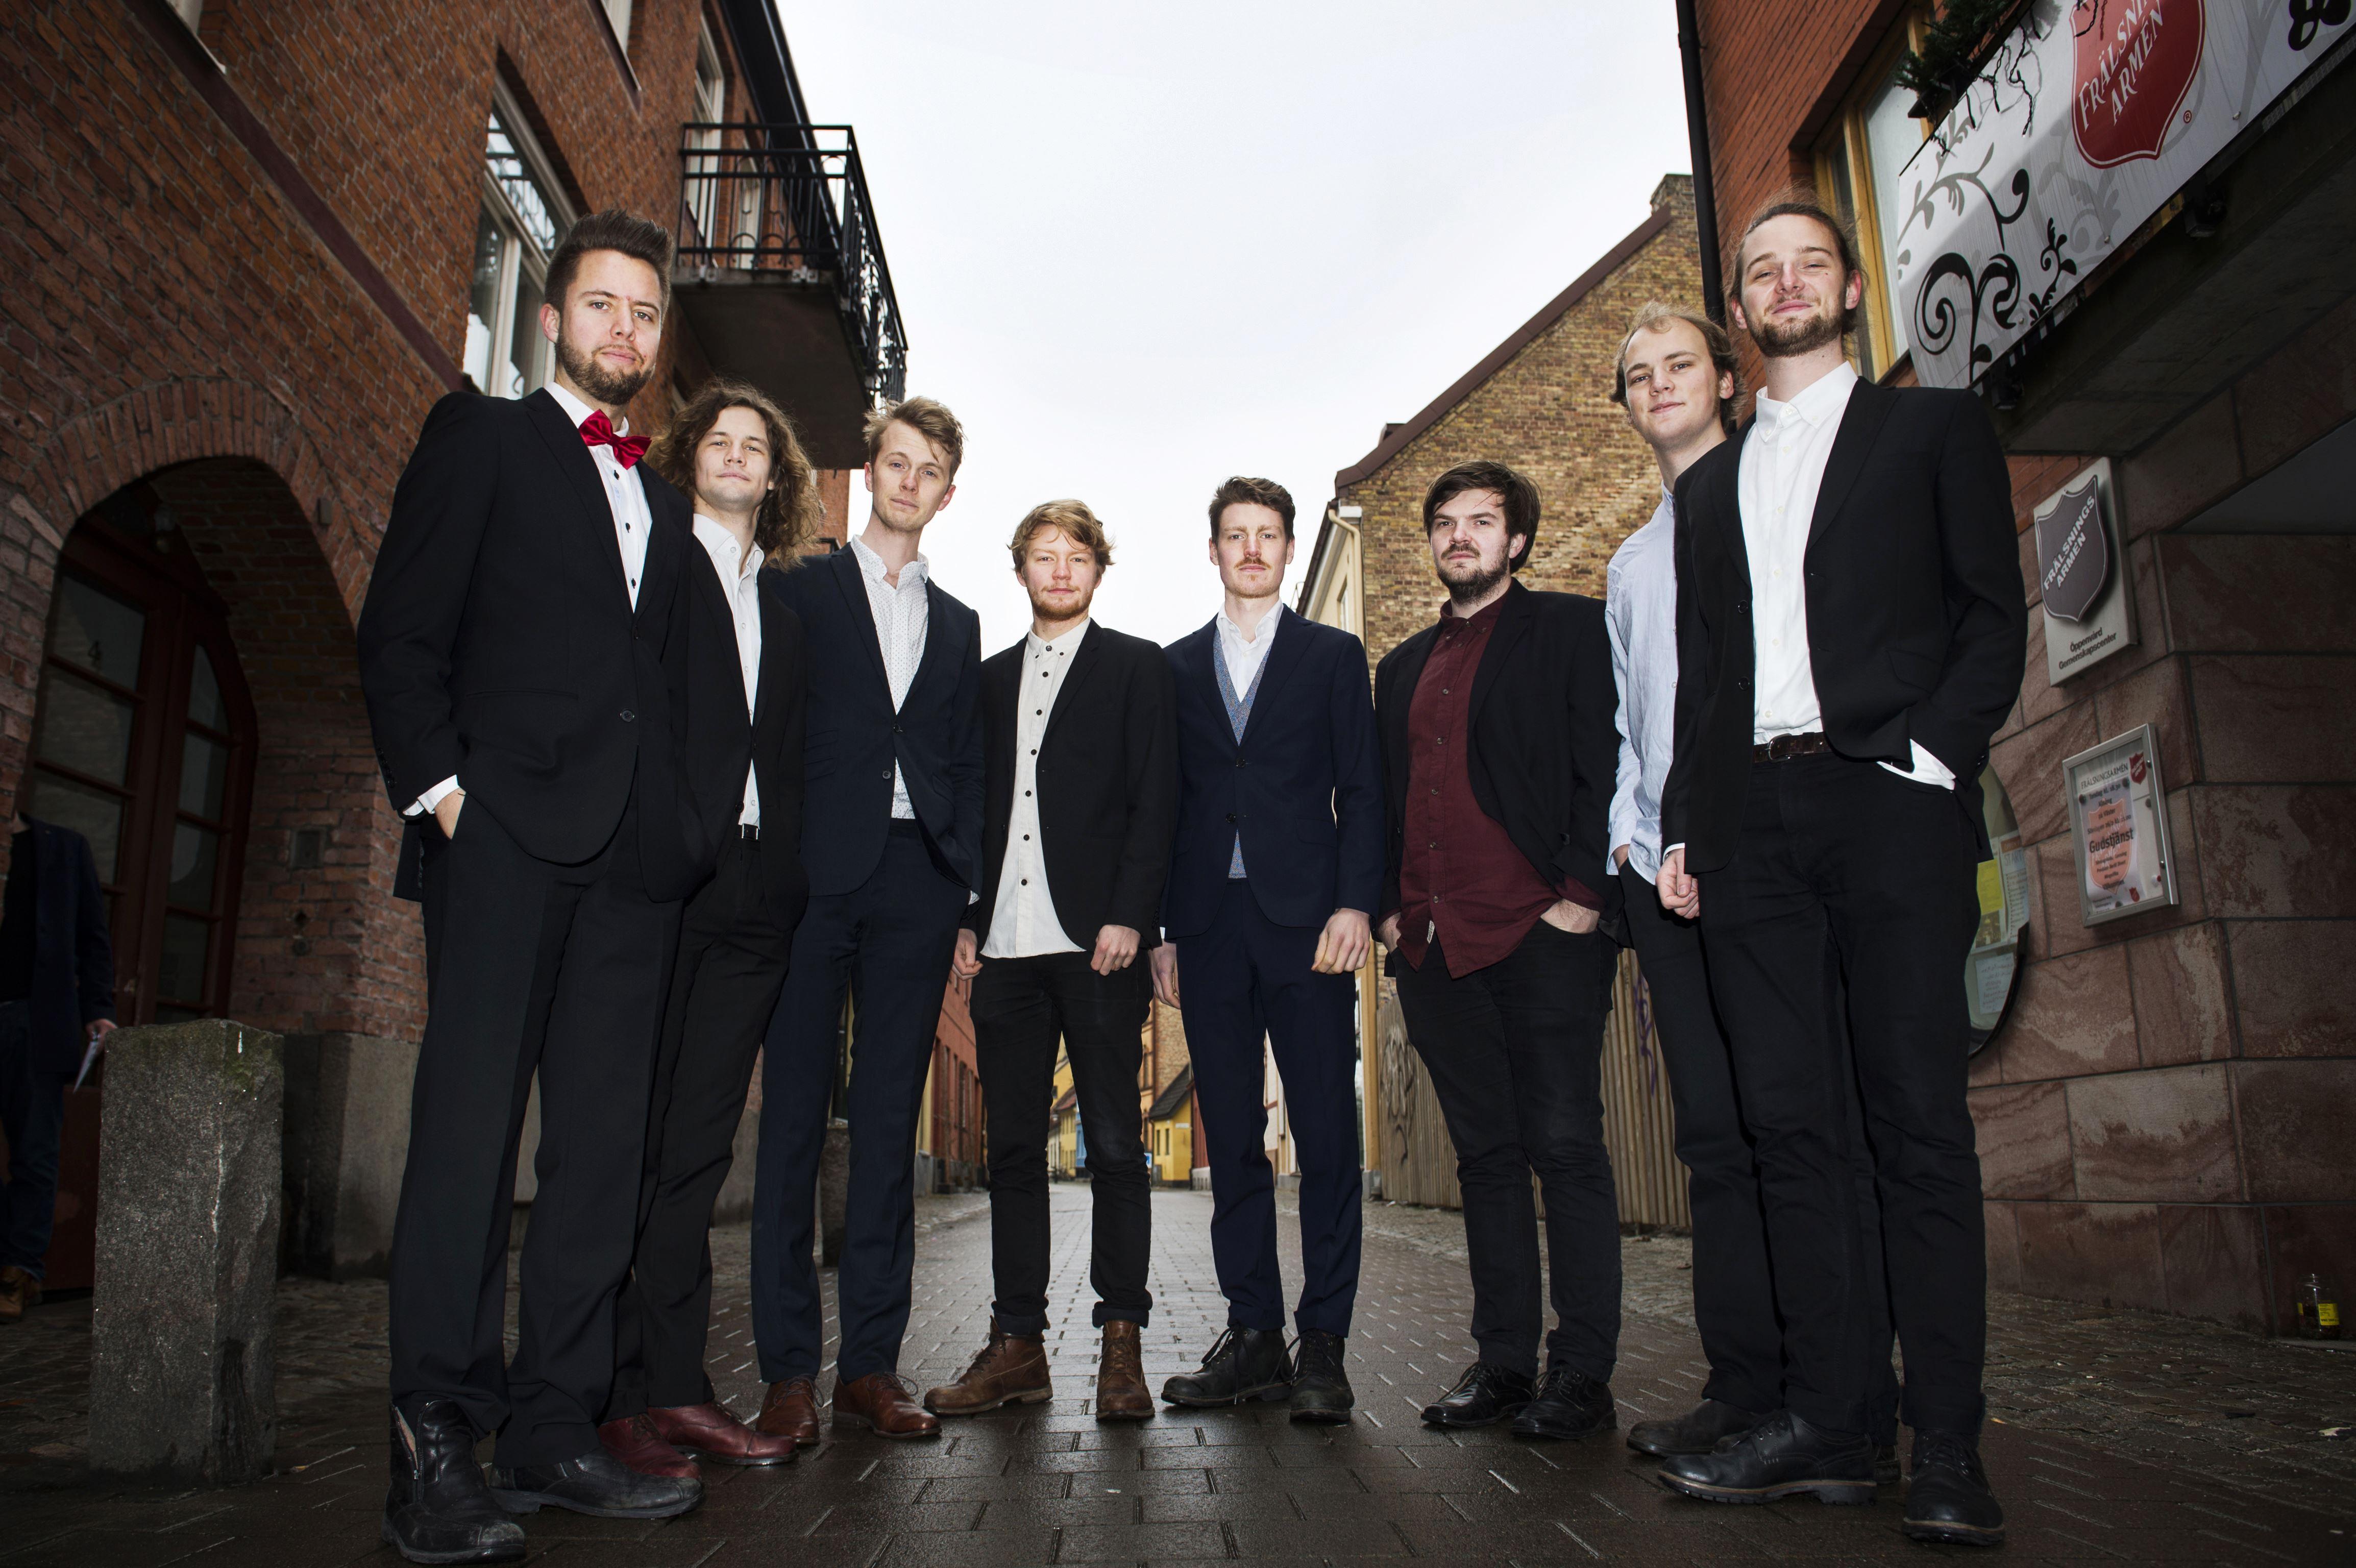 Scensommar: Fredbergs orkester